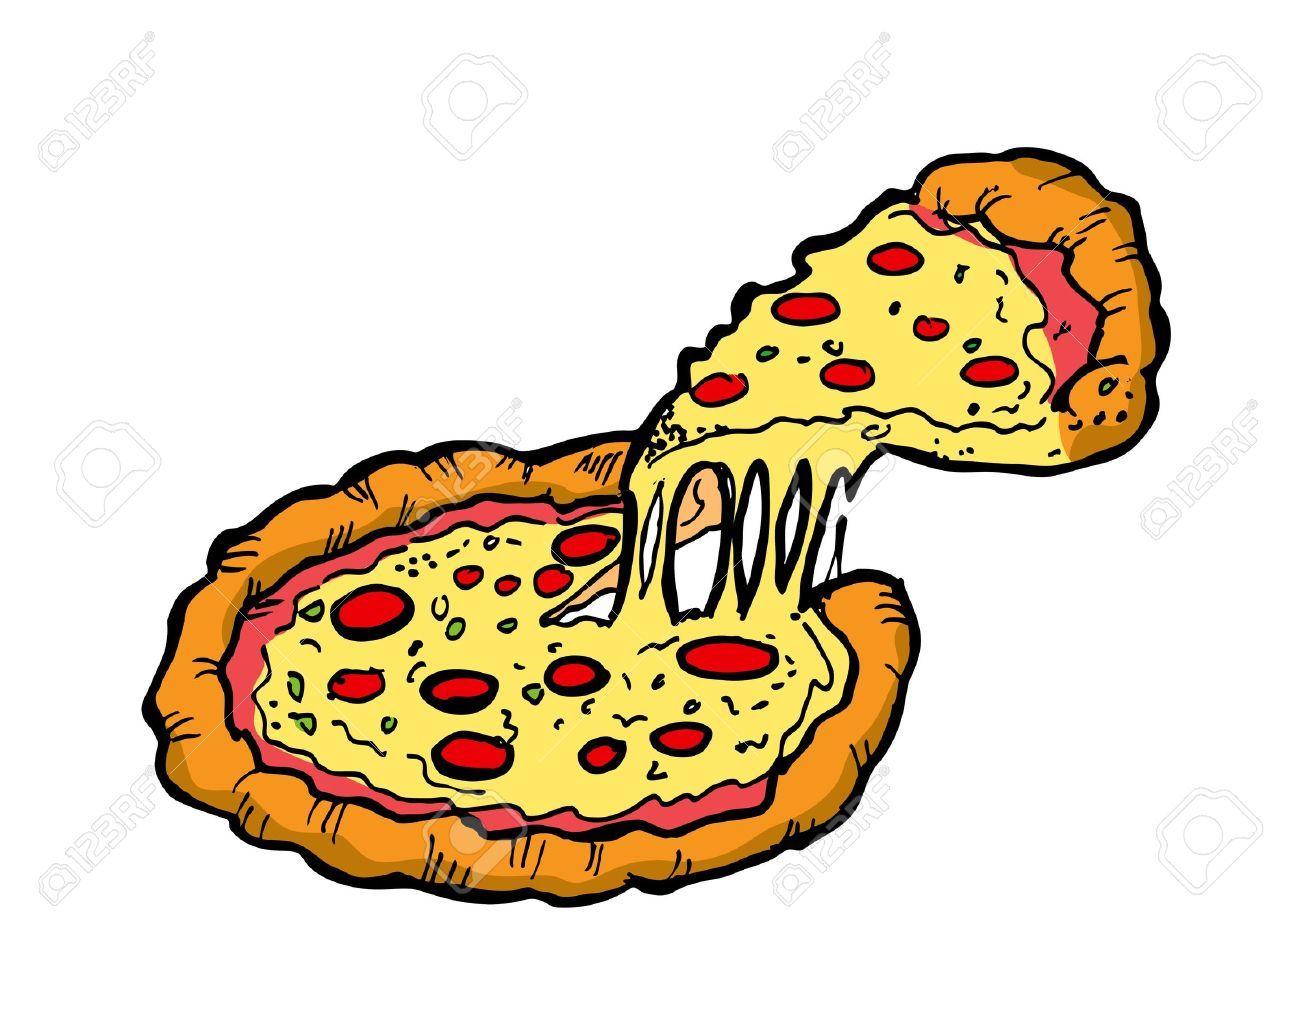 Imagen Relacionada New York Style Pizza Pizza Cartoon Clip Art